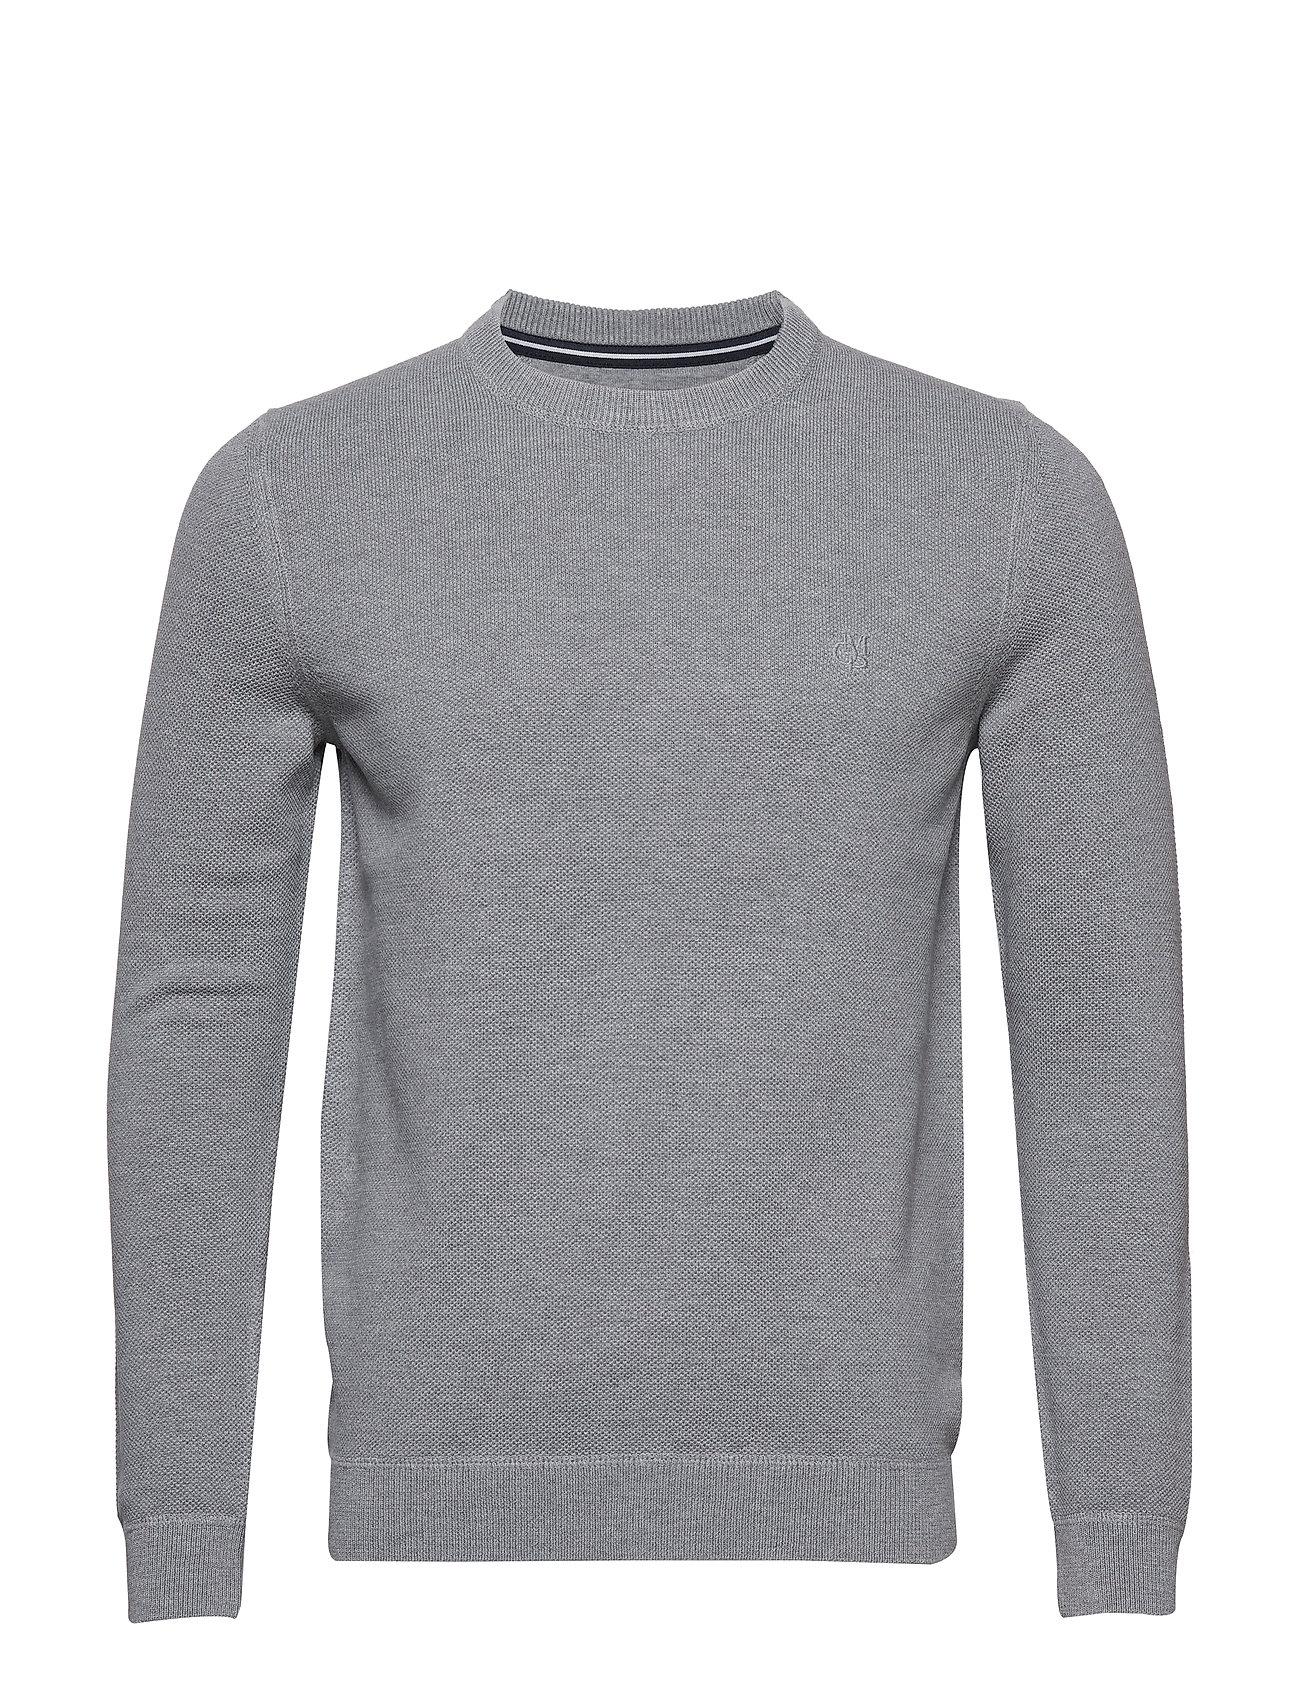 Marc O'Polo Pullover Long Sleeve - GREY MELANGE